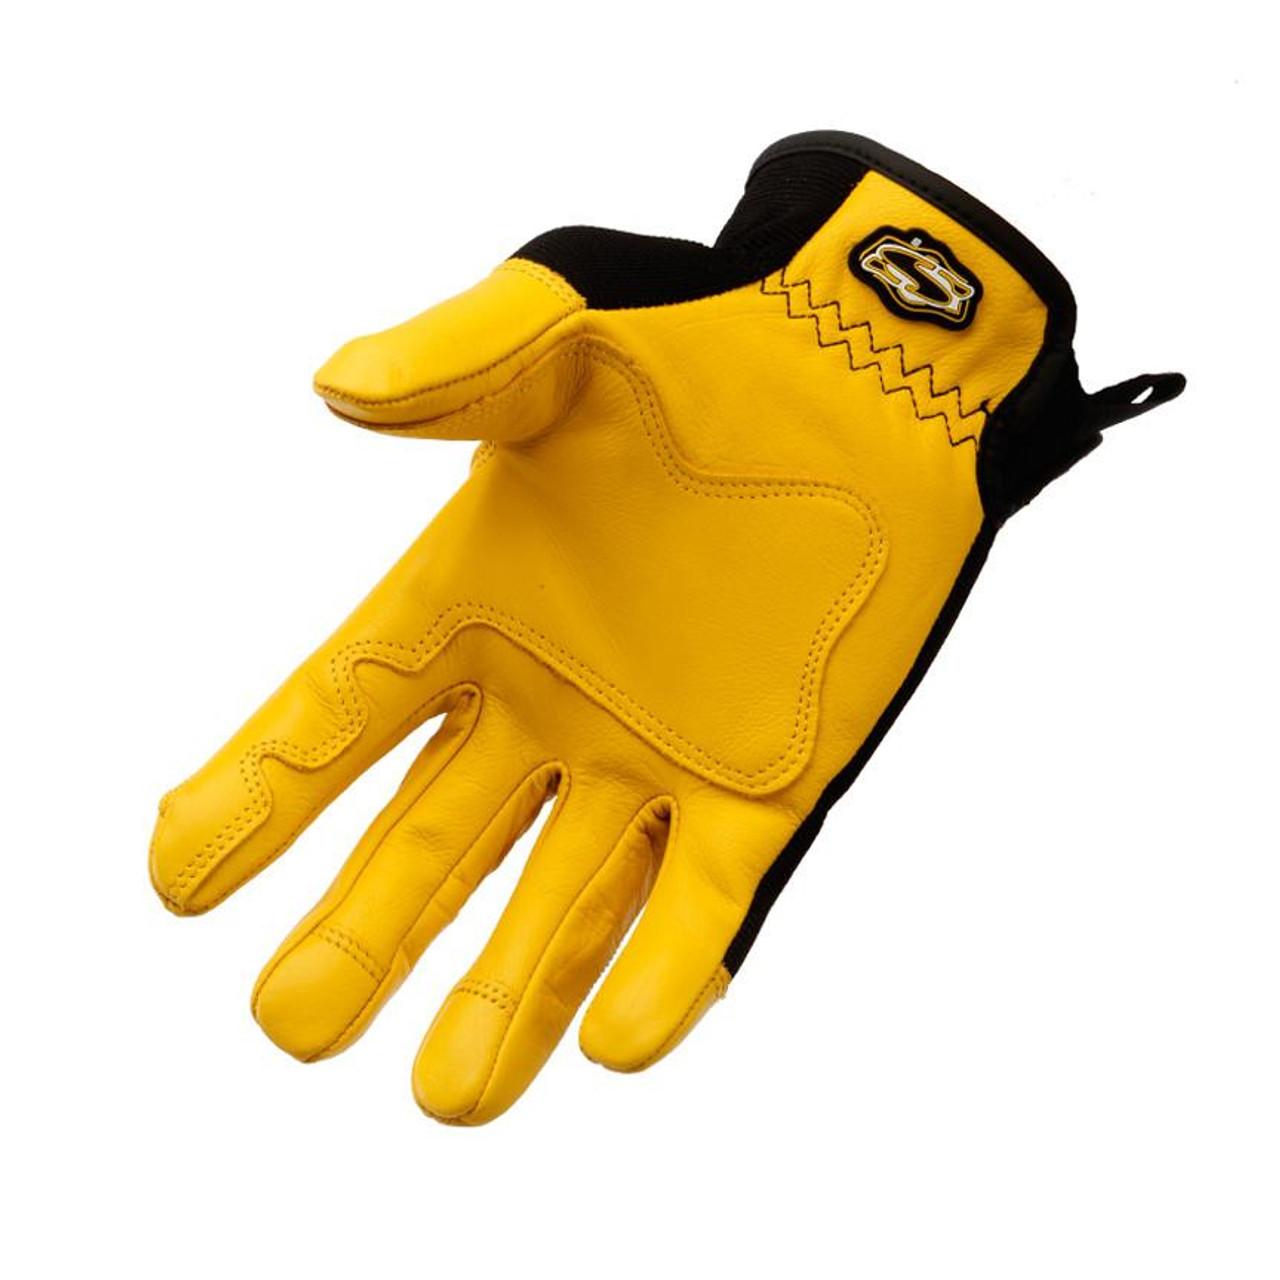 SetWear Pro Glove Tan